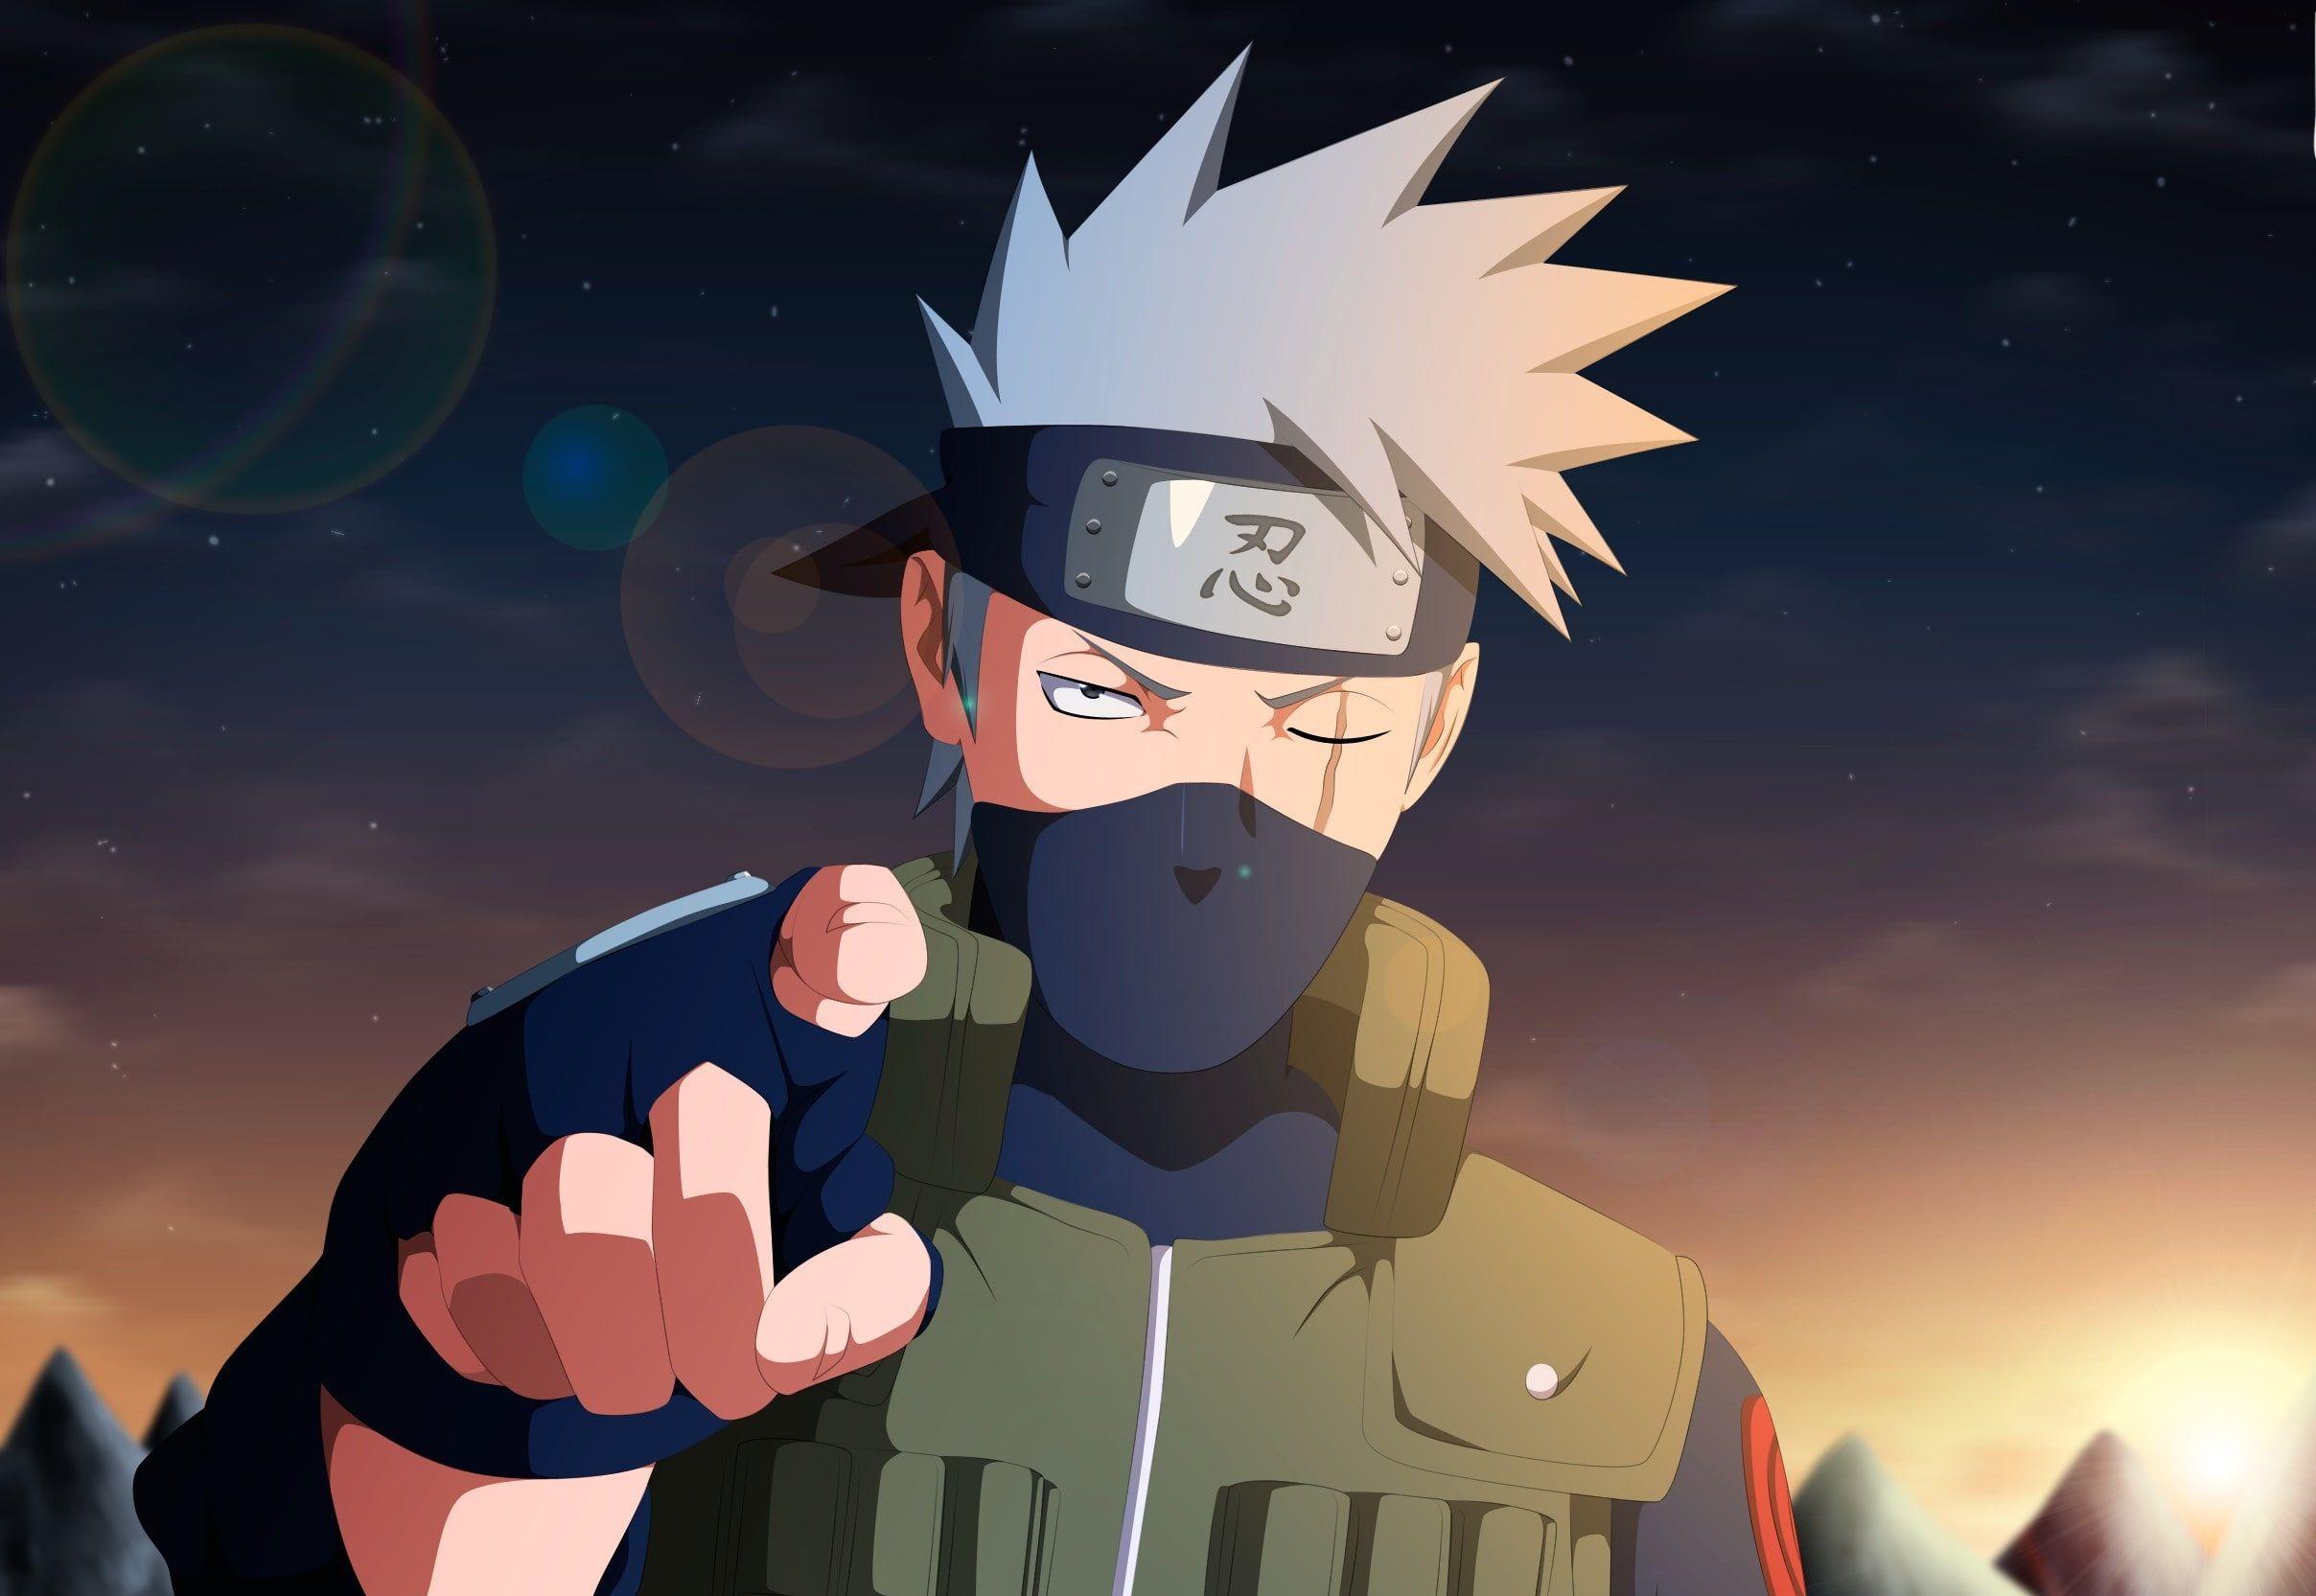 Naruto War Anime Ninja Manga Kakashi Hatake Kakashi Shinobi Naruto Shippuden Jounin Hitayate Scar Vest 4th N Anime Wallpaper Digital Art Anime Anime